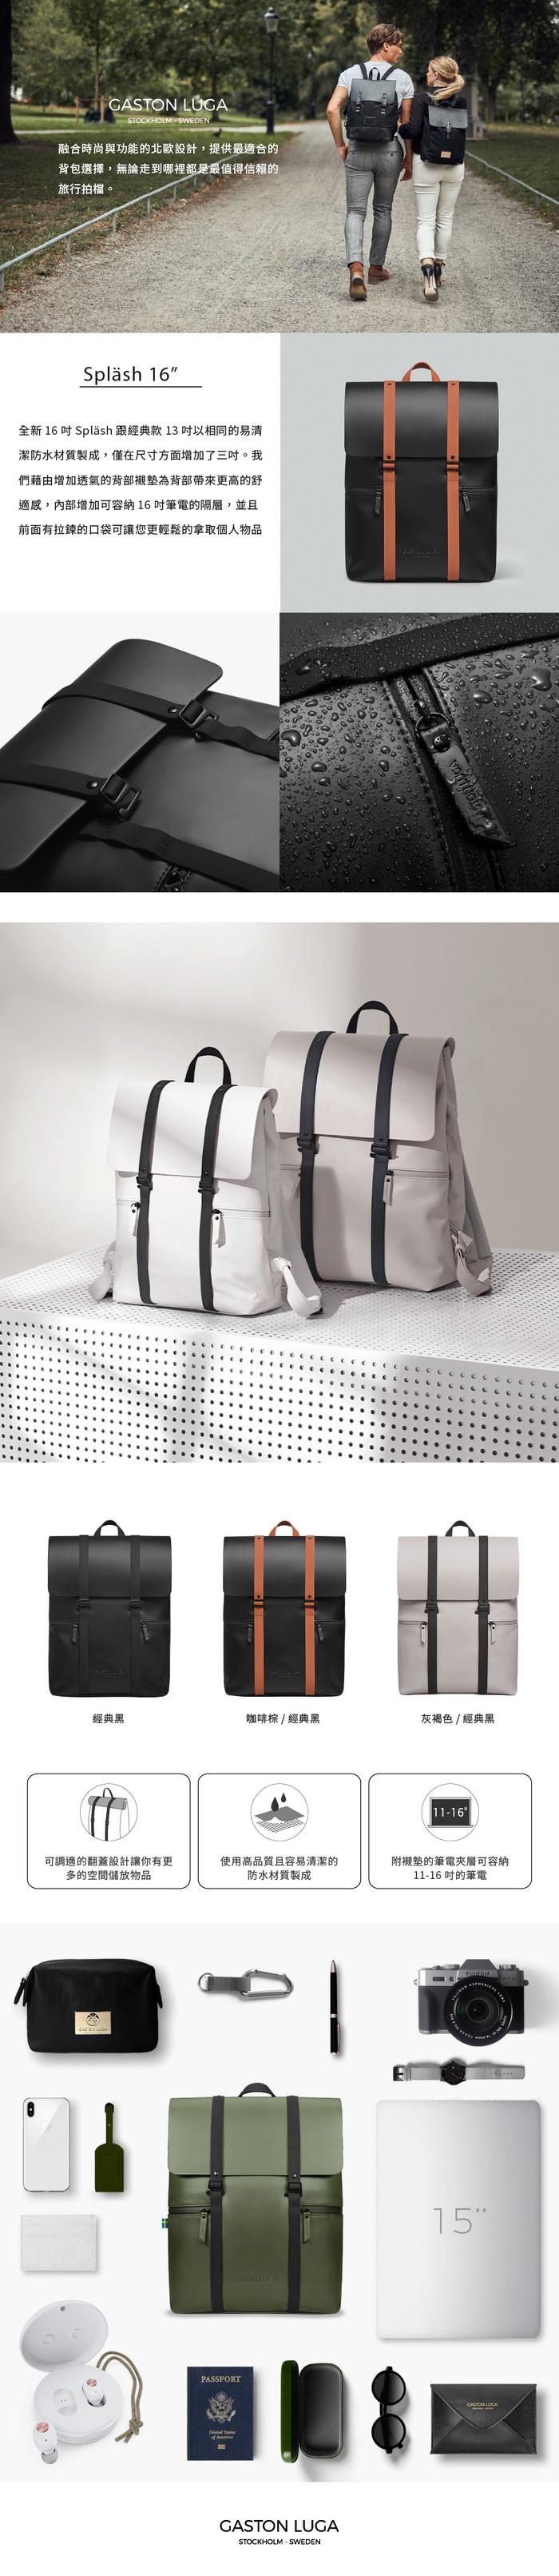 GASTON LUGA| Splash 16吋大容量個性後背包(大象灰/黑色)